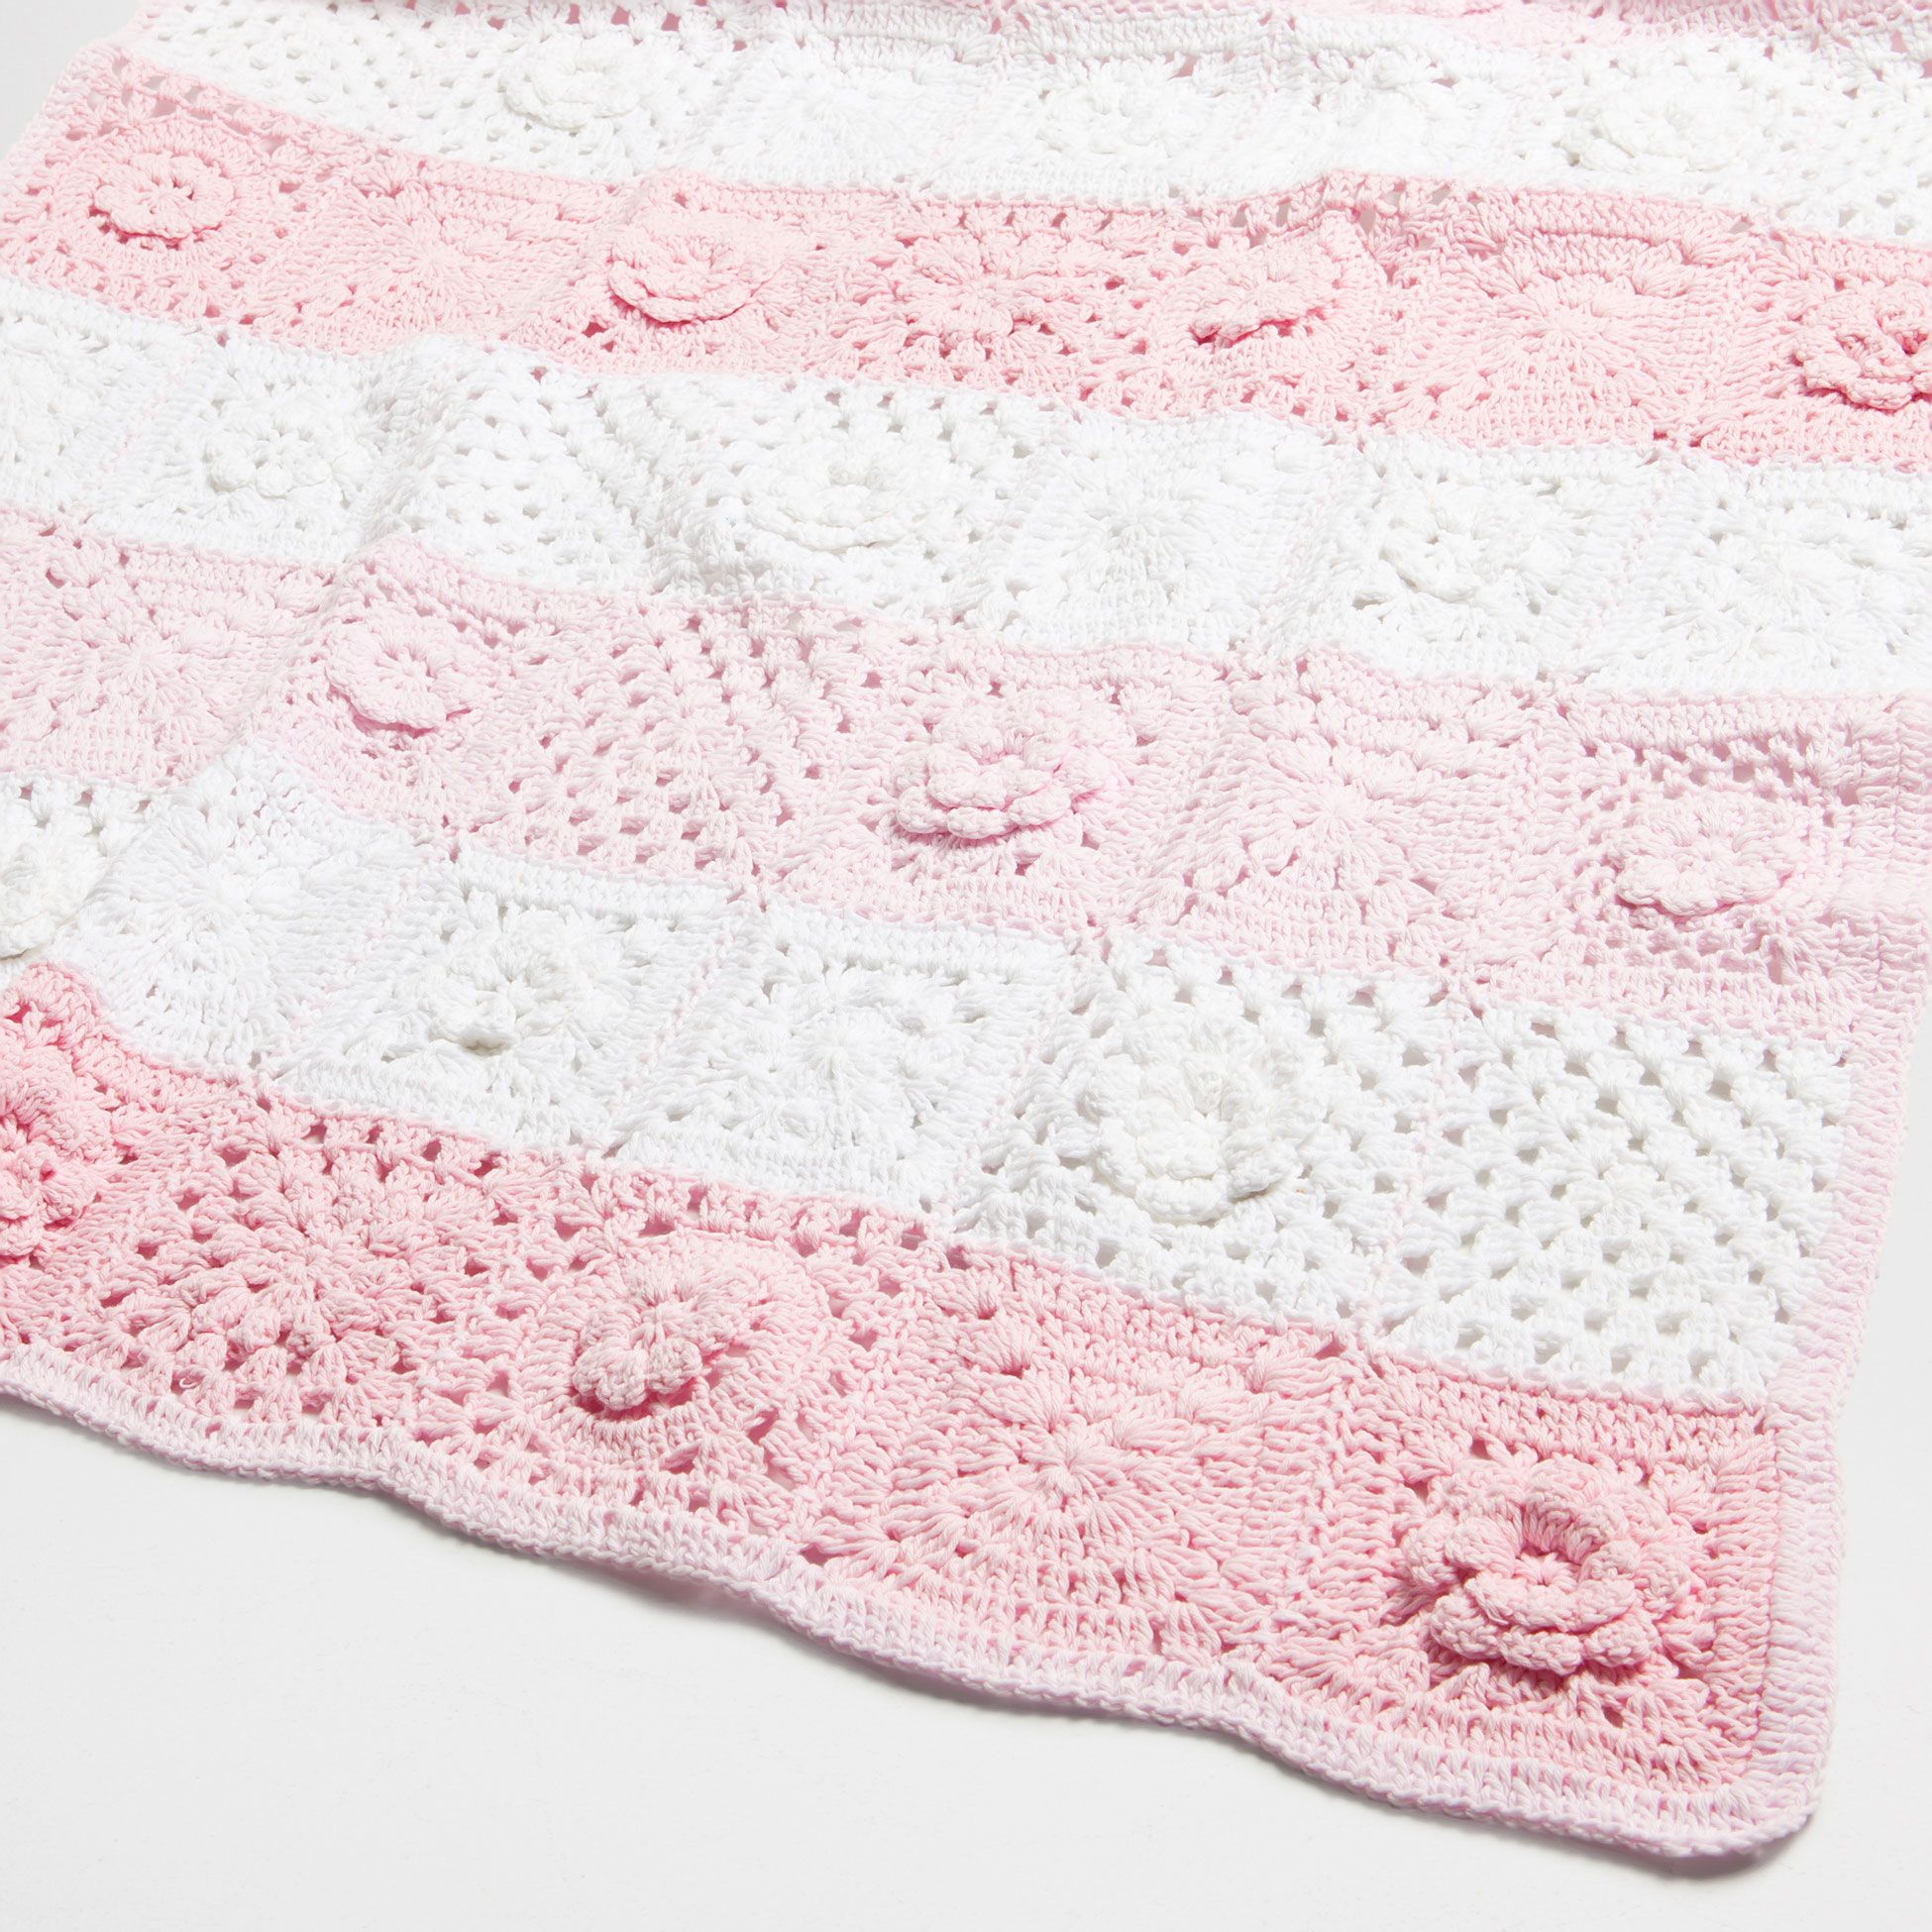 Manta algod n crochet mantas cama zara home espa a - Zara home es ...